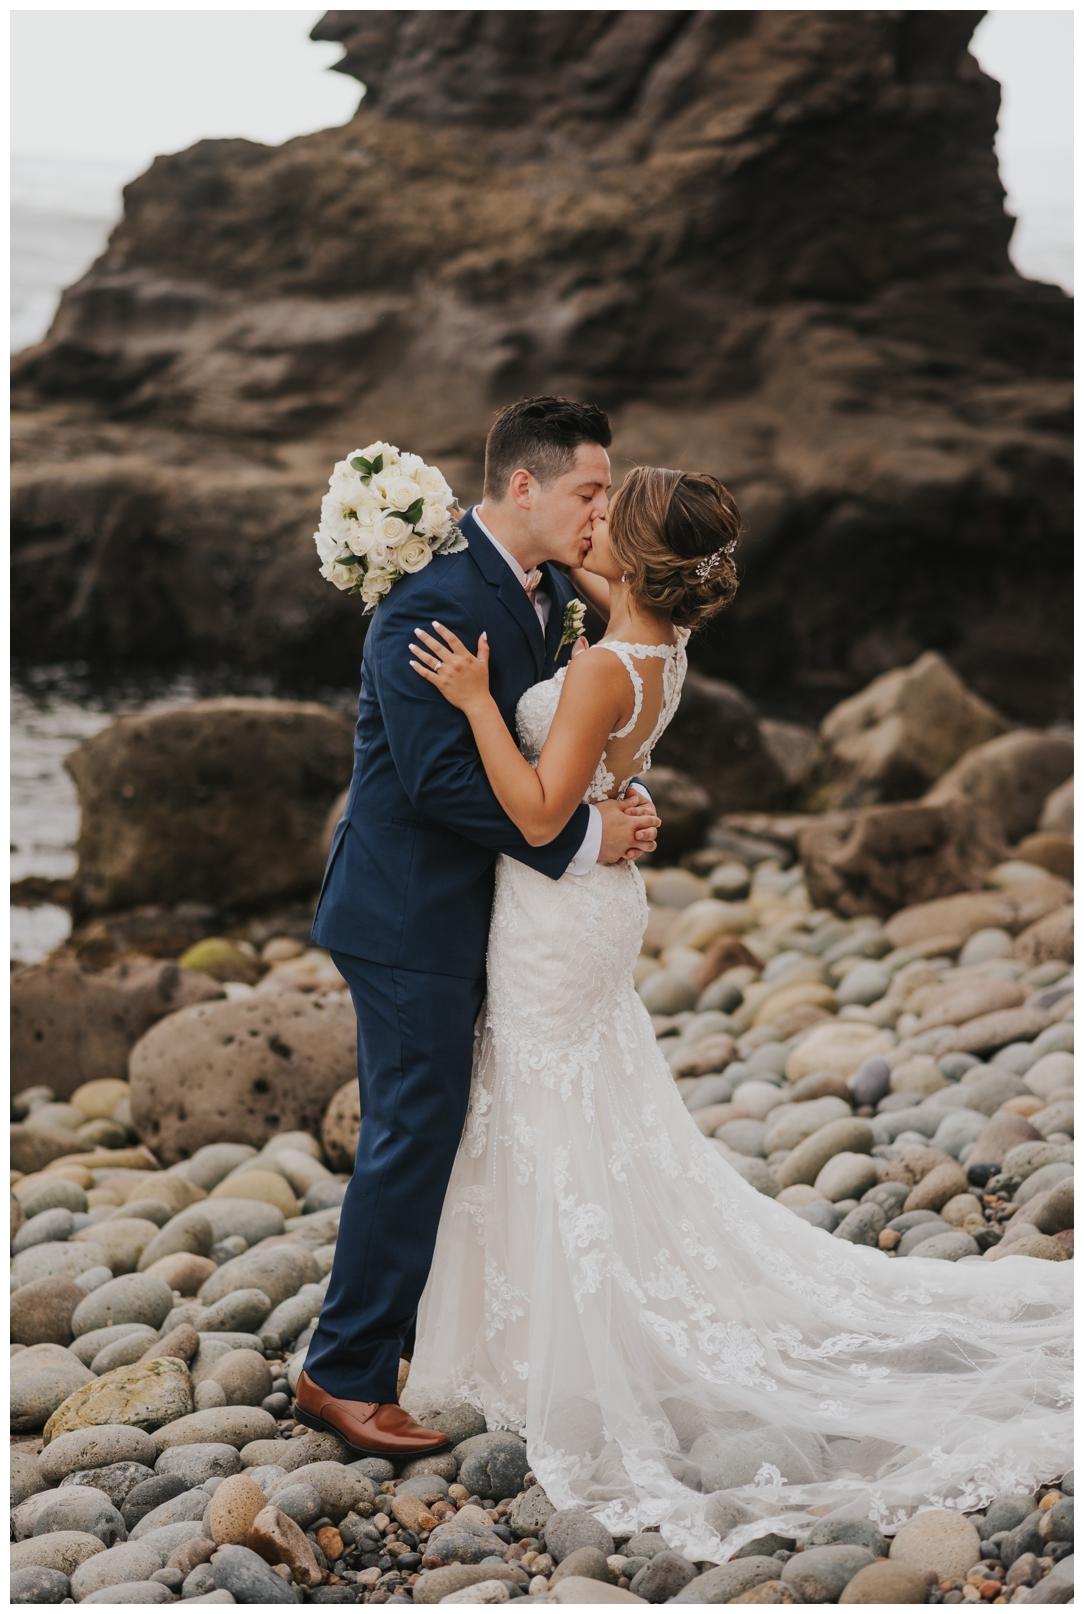 Mexico-Destination-Wedding_0032.jpg